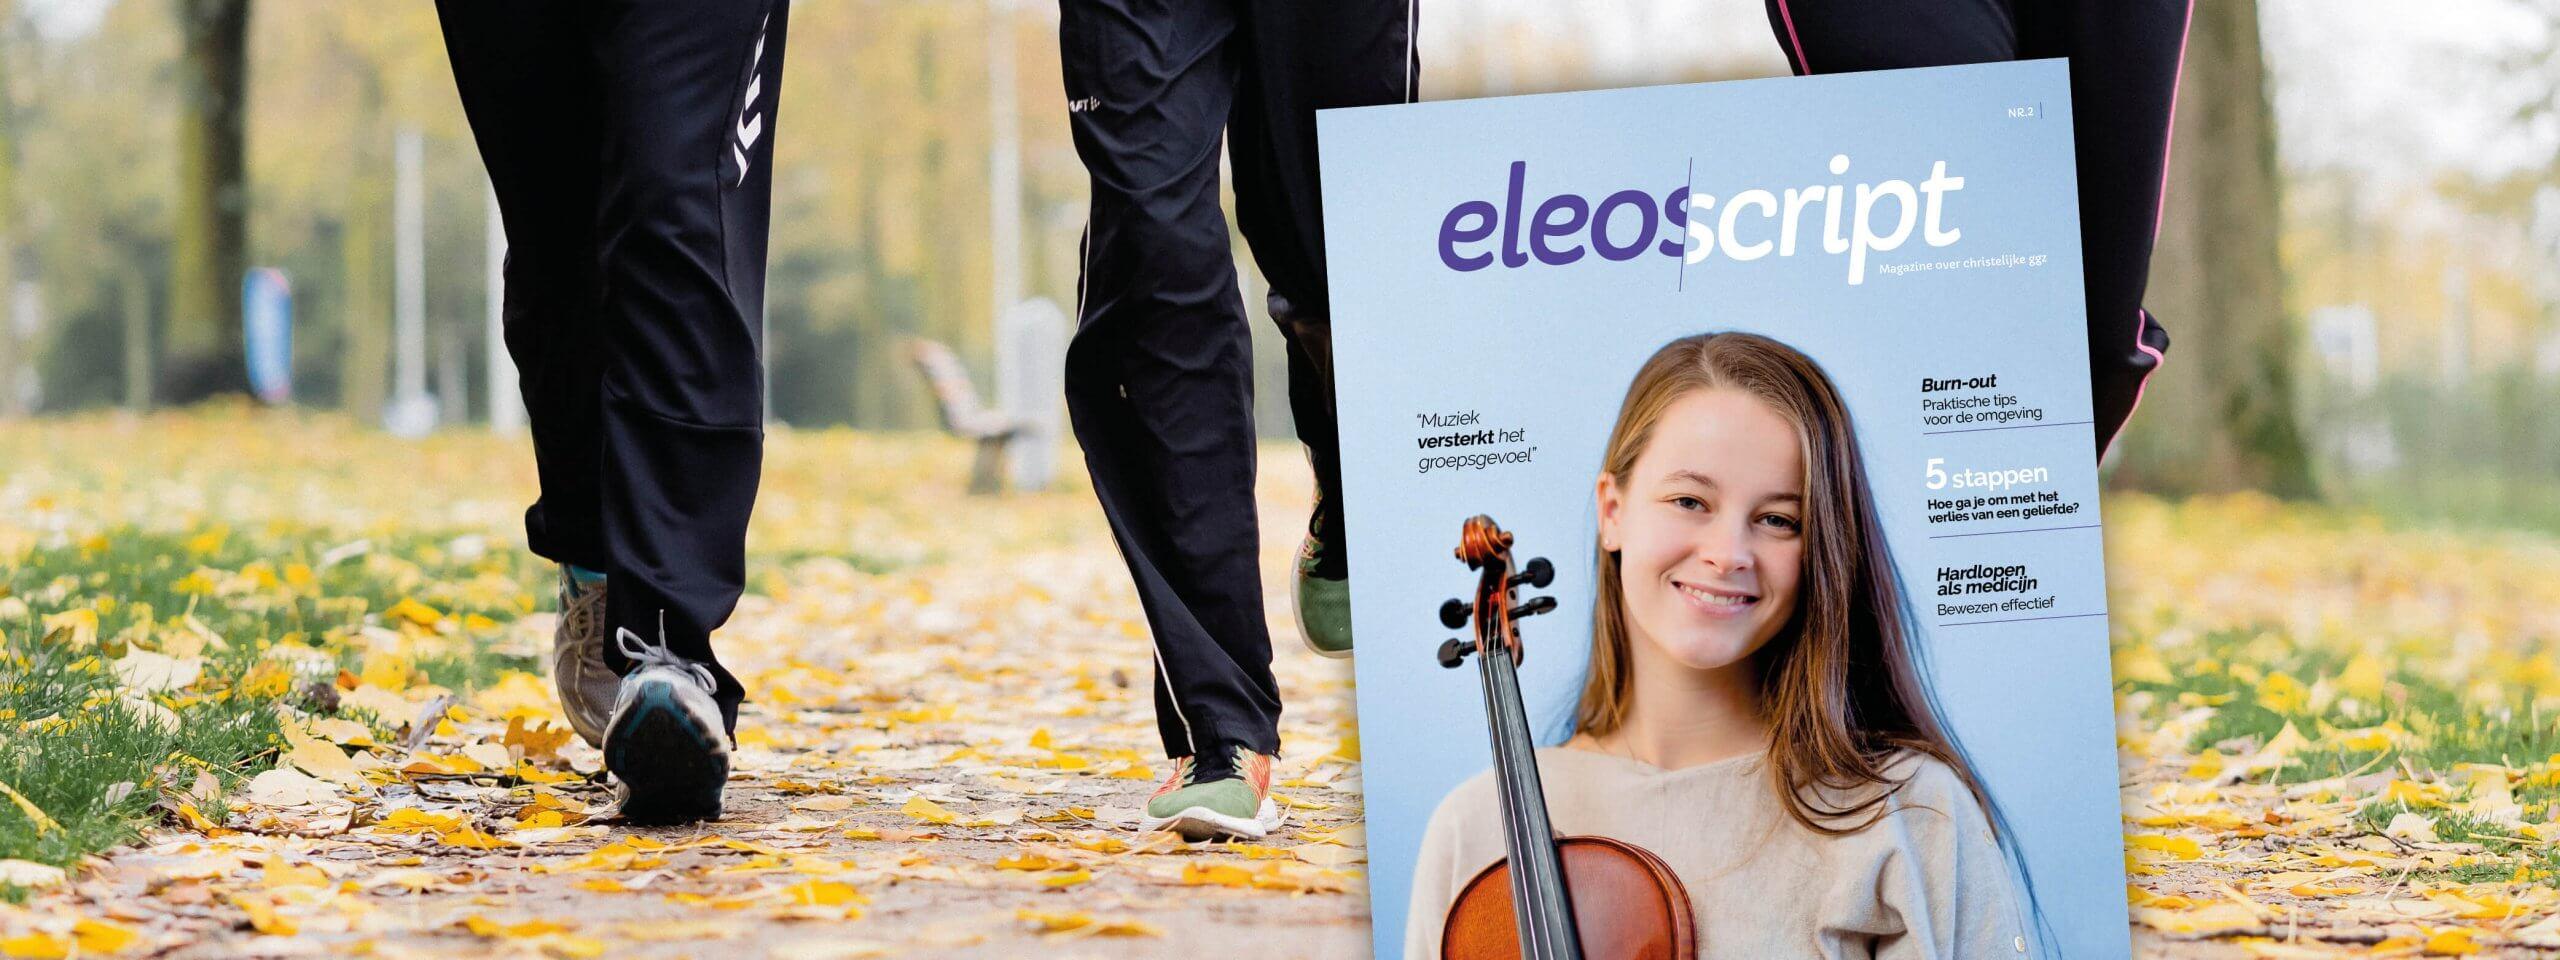 Eleoscript